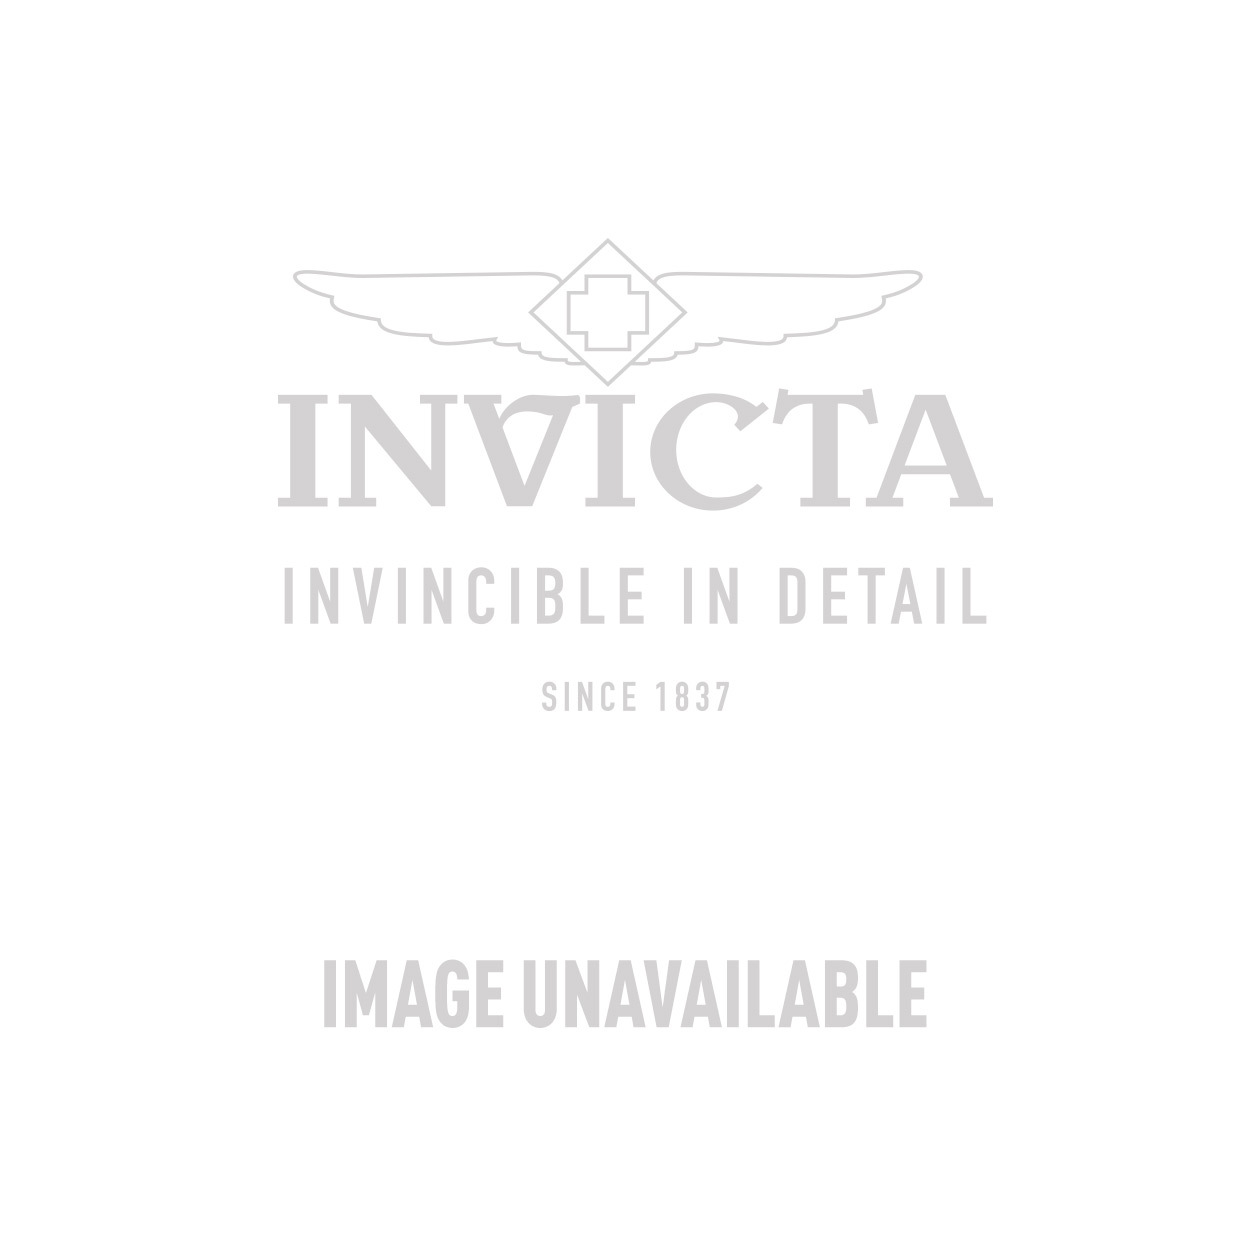 8fd10bb8b Invicta Pro Diver SCUBA Men's Quartz Stainless Steel Case, Black Dial -  22318 - Official Invicta Store